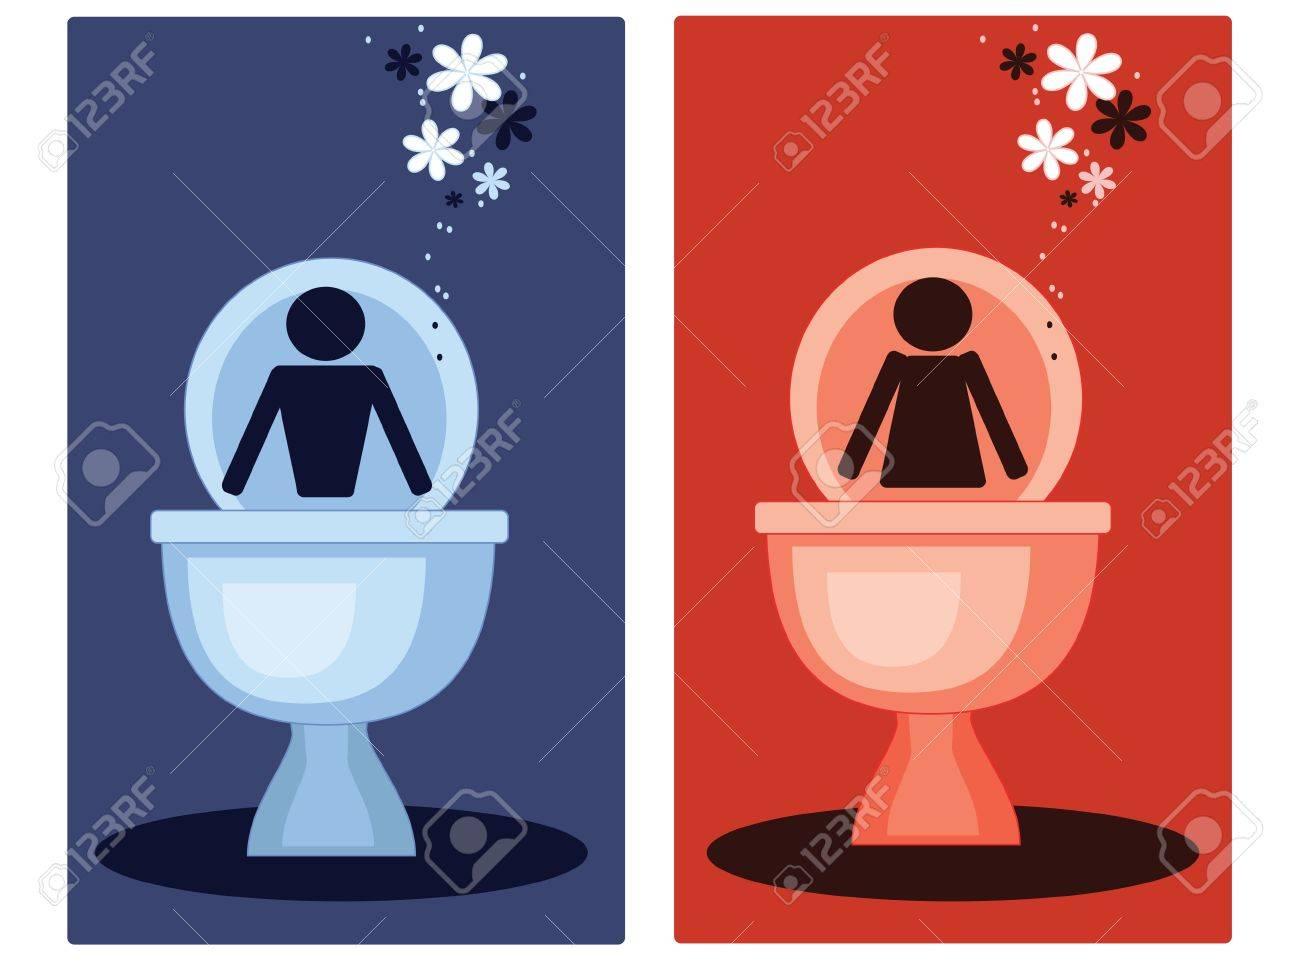 Toilet symbols,vector Stock Vector - 10545394